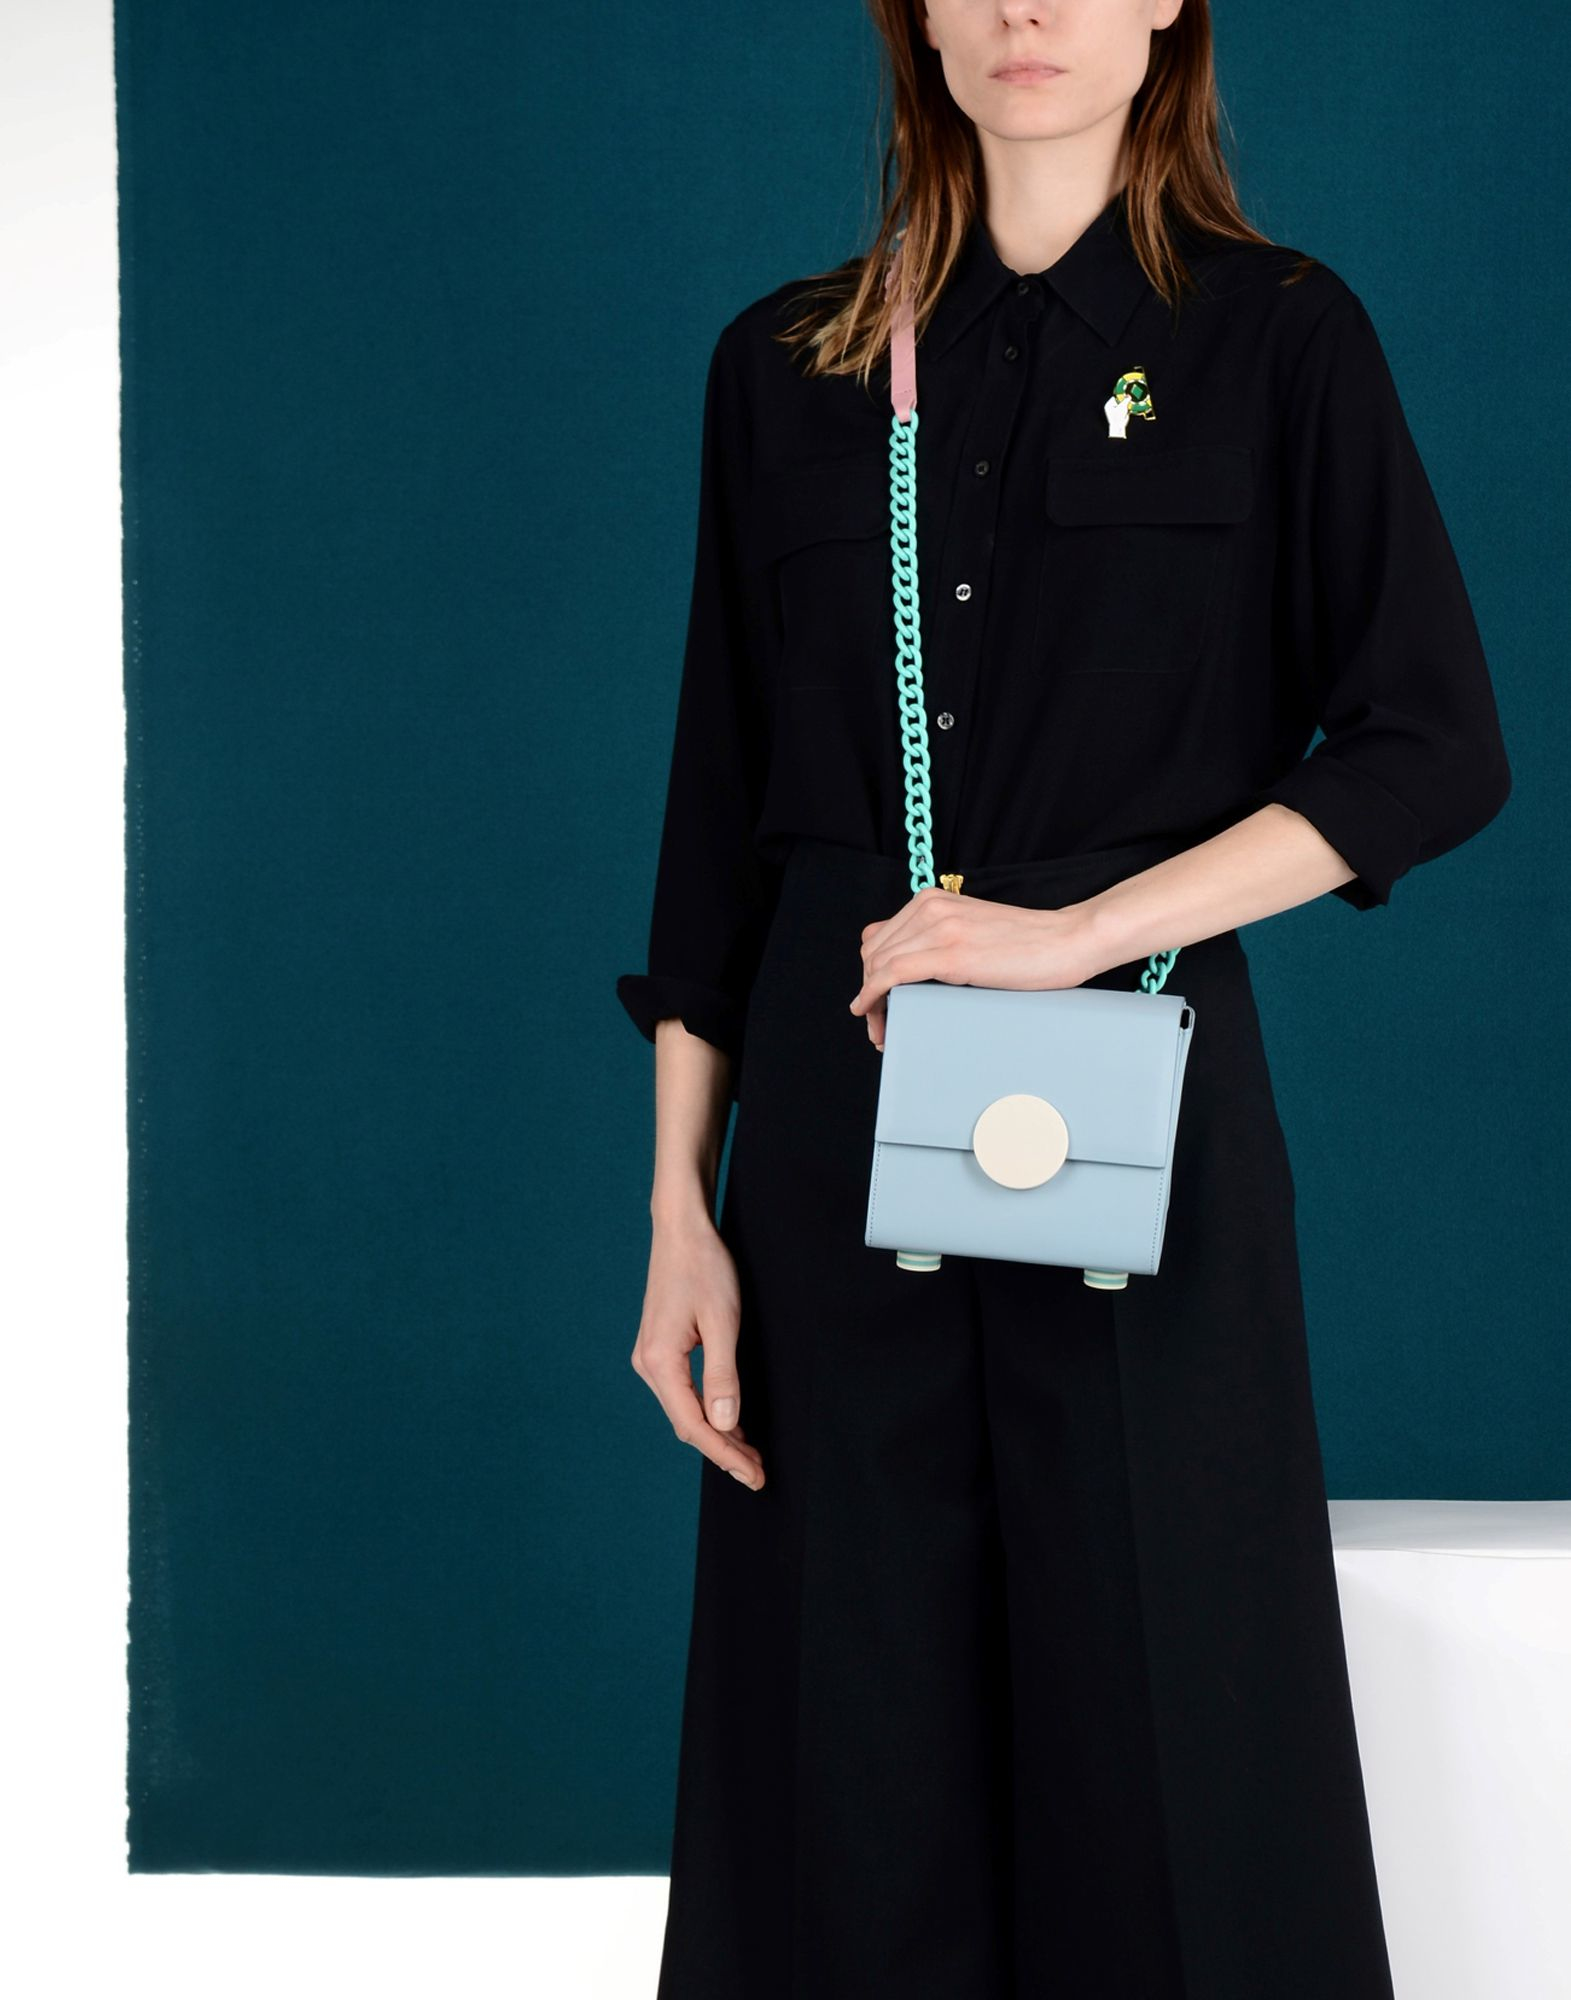 Matter Matters Leather Cross-body Bag in Sky Blue (Blue)